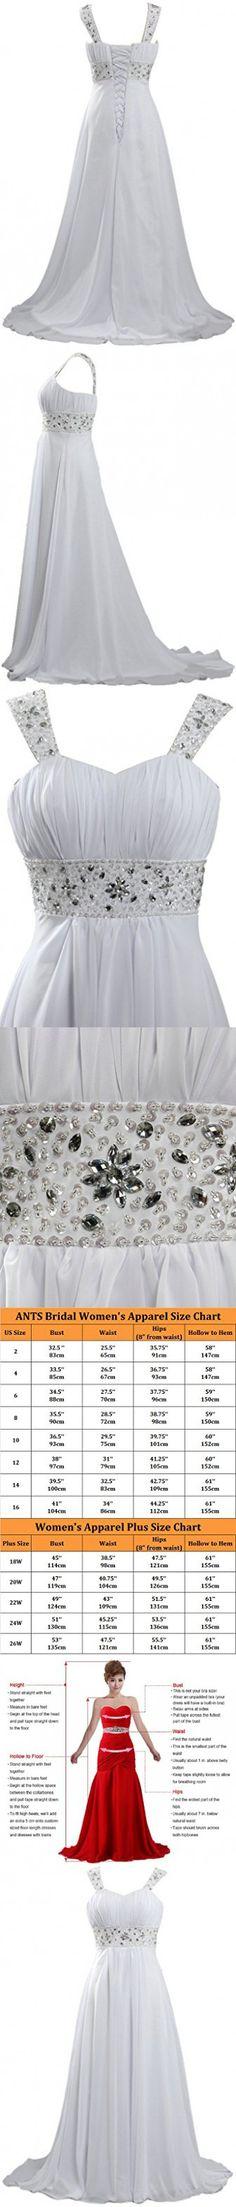 ANTS Women's Long Chiffon Beach Wedding Dresses 2016 Cap Sleeves Size 20W US White